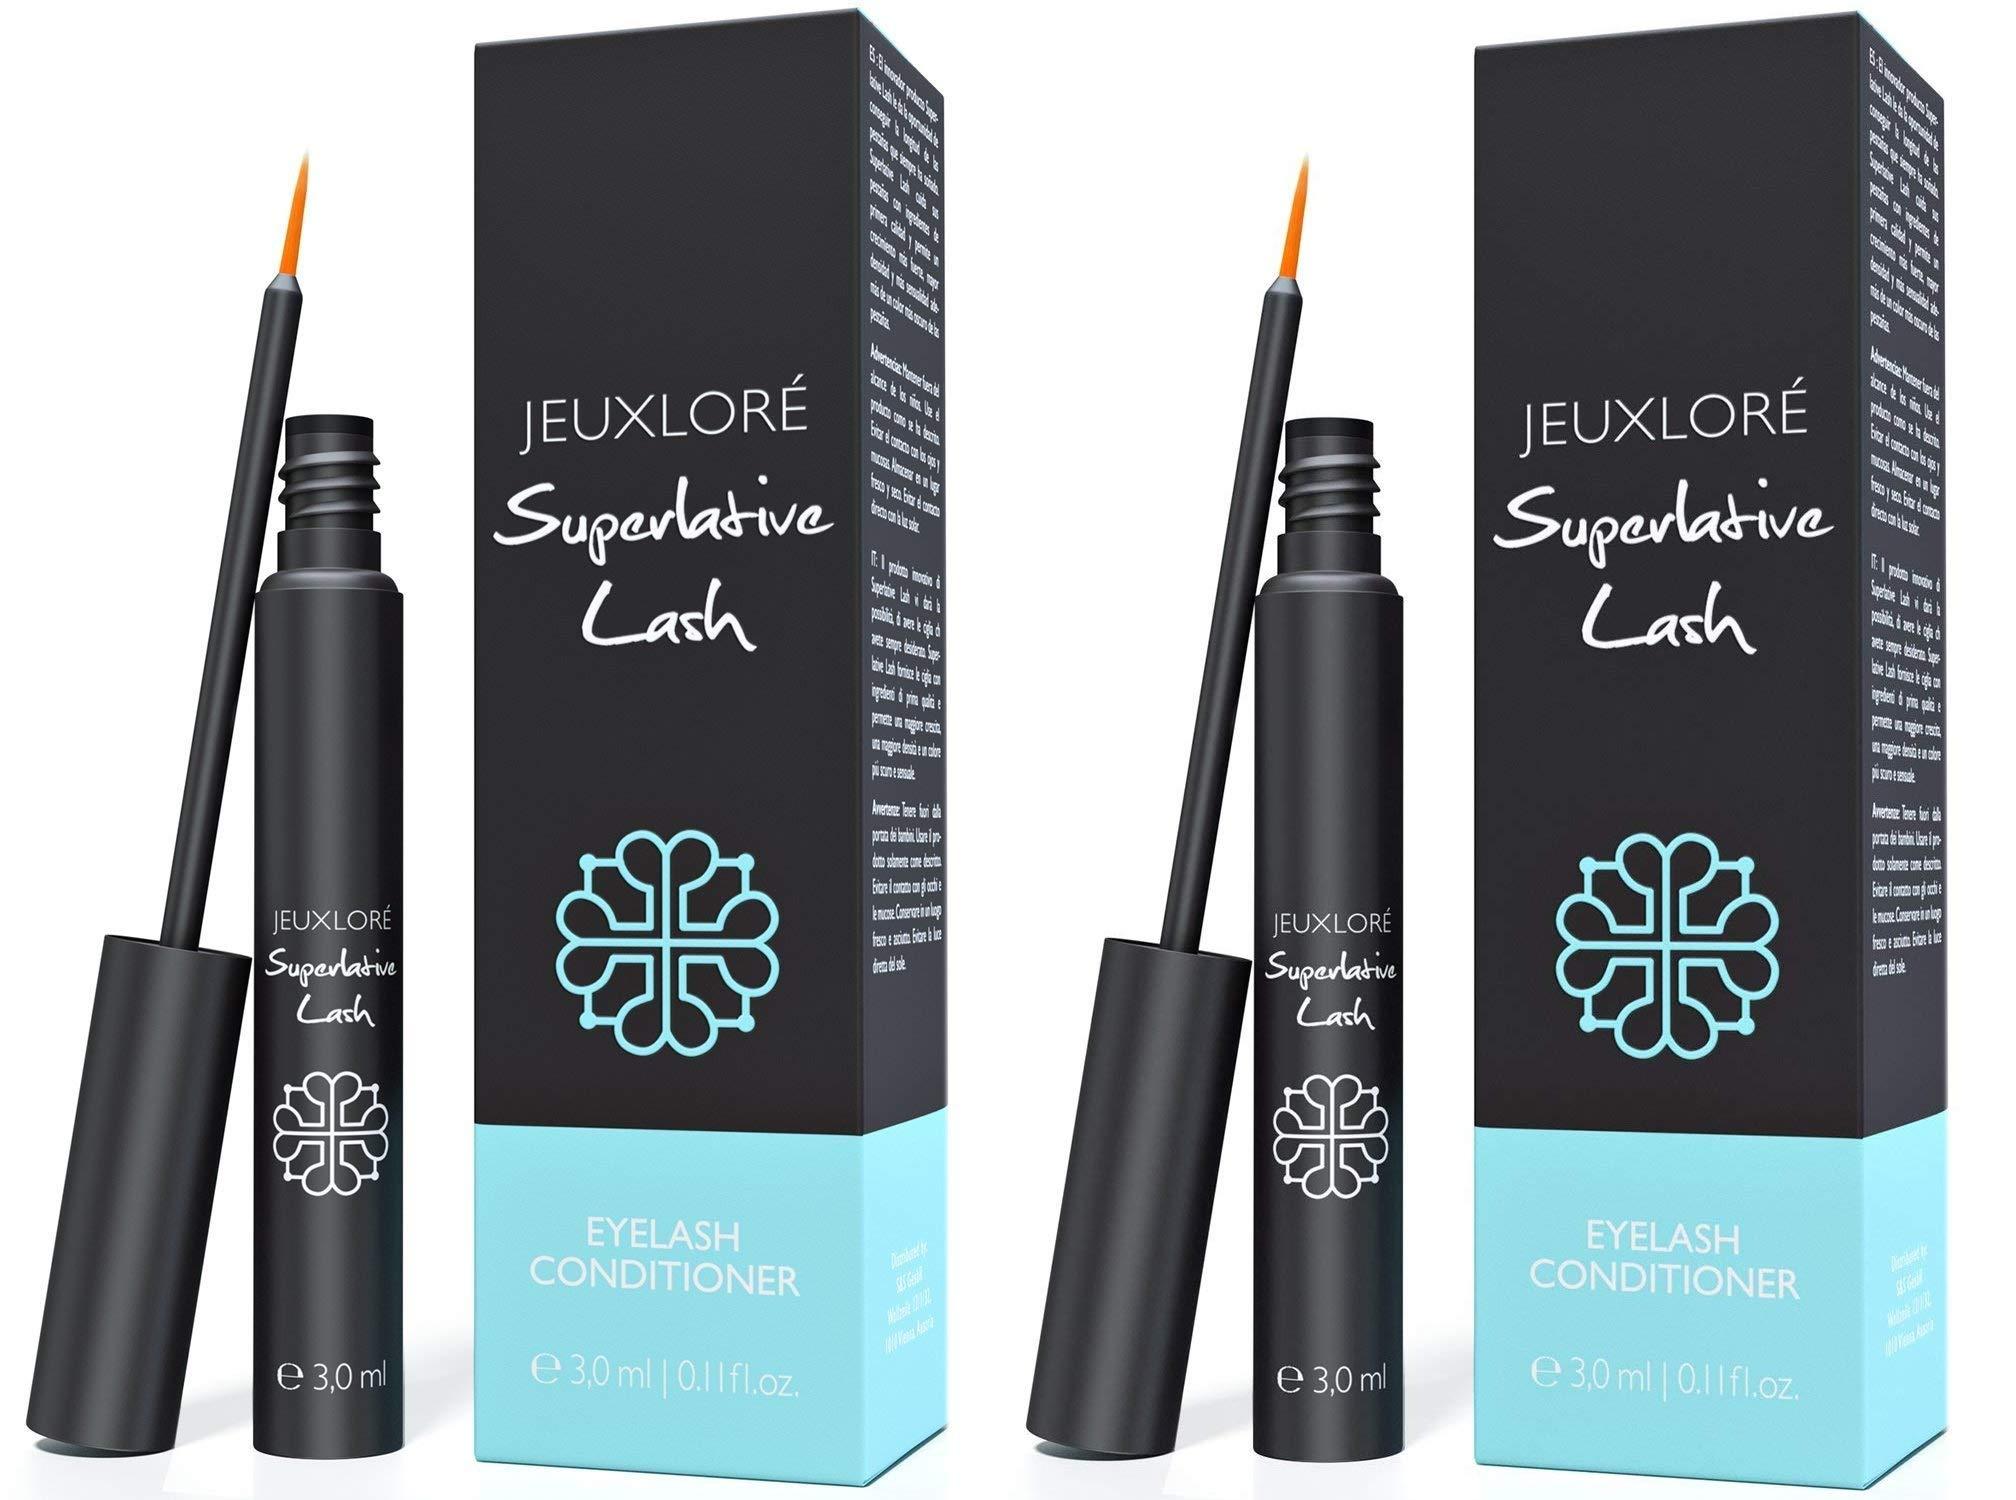 JEUXLORÉ - Eyelash Growth Serum - Thicker, Longer Eyelashes & Eyebrows - 3 ml (2 Pack)